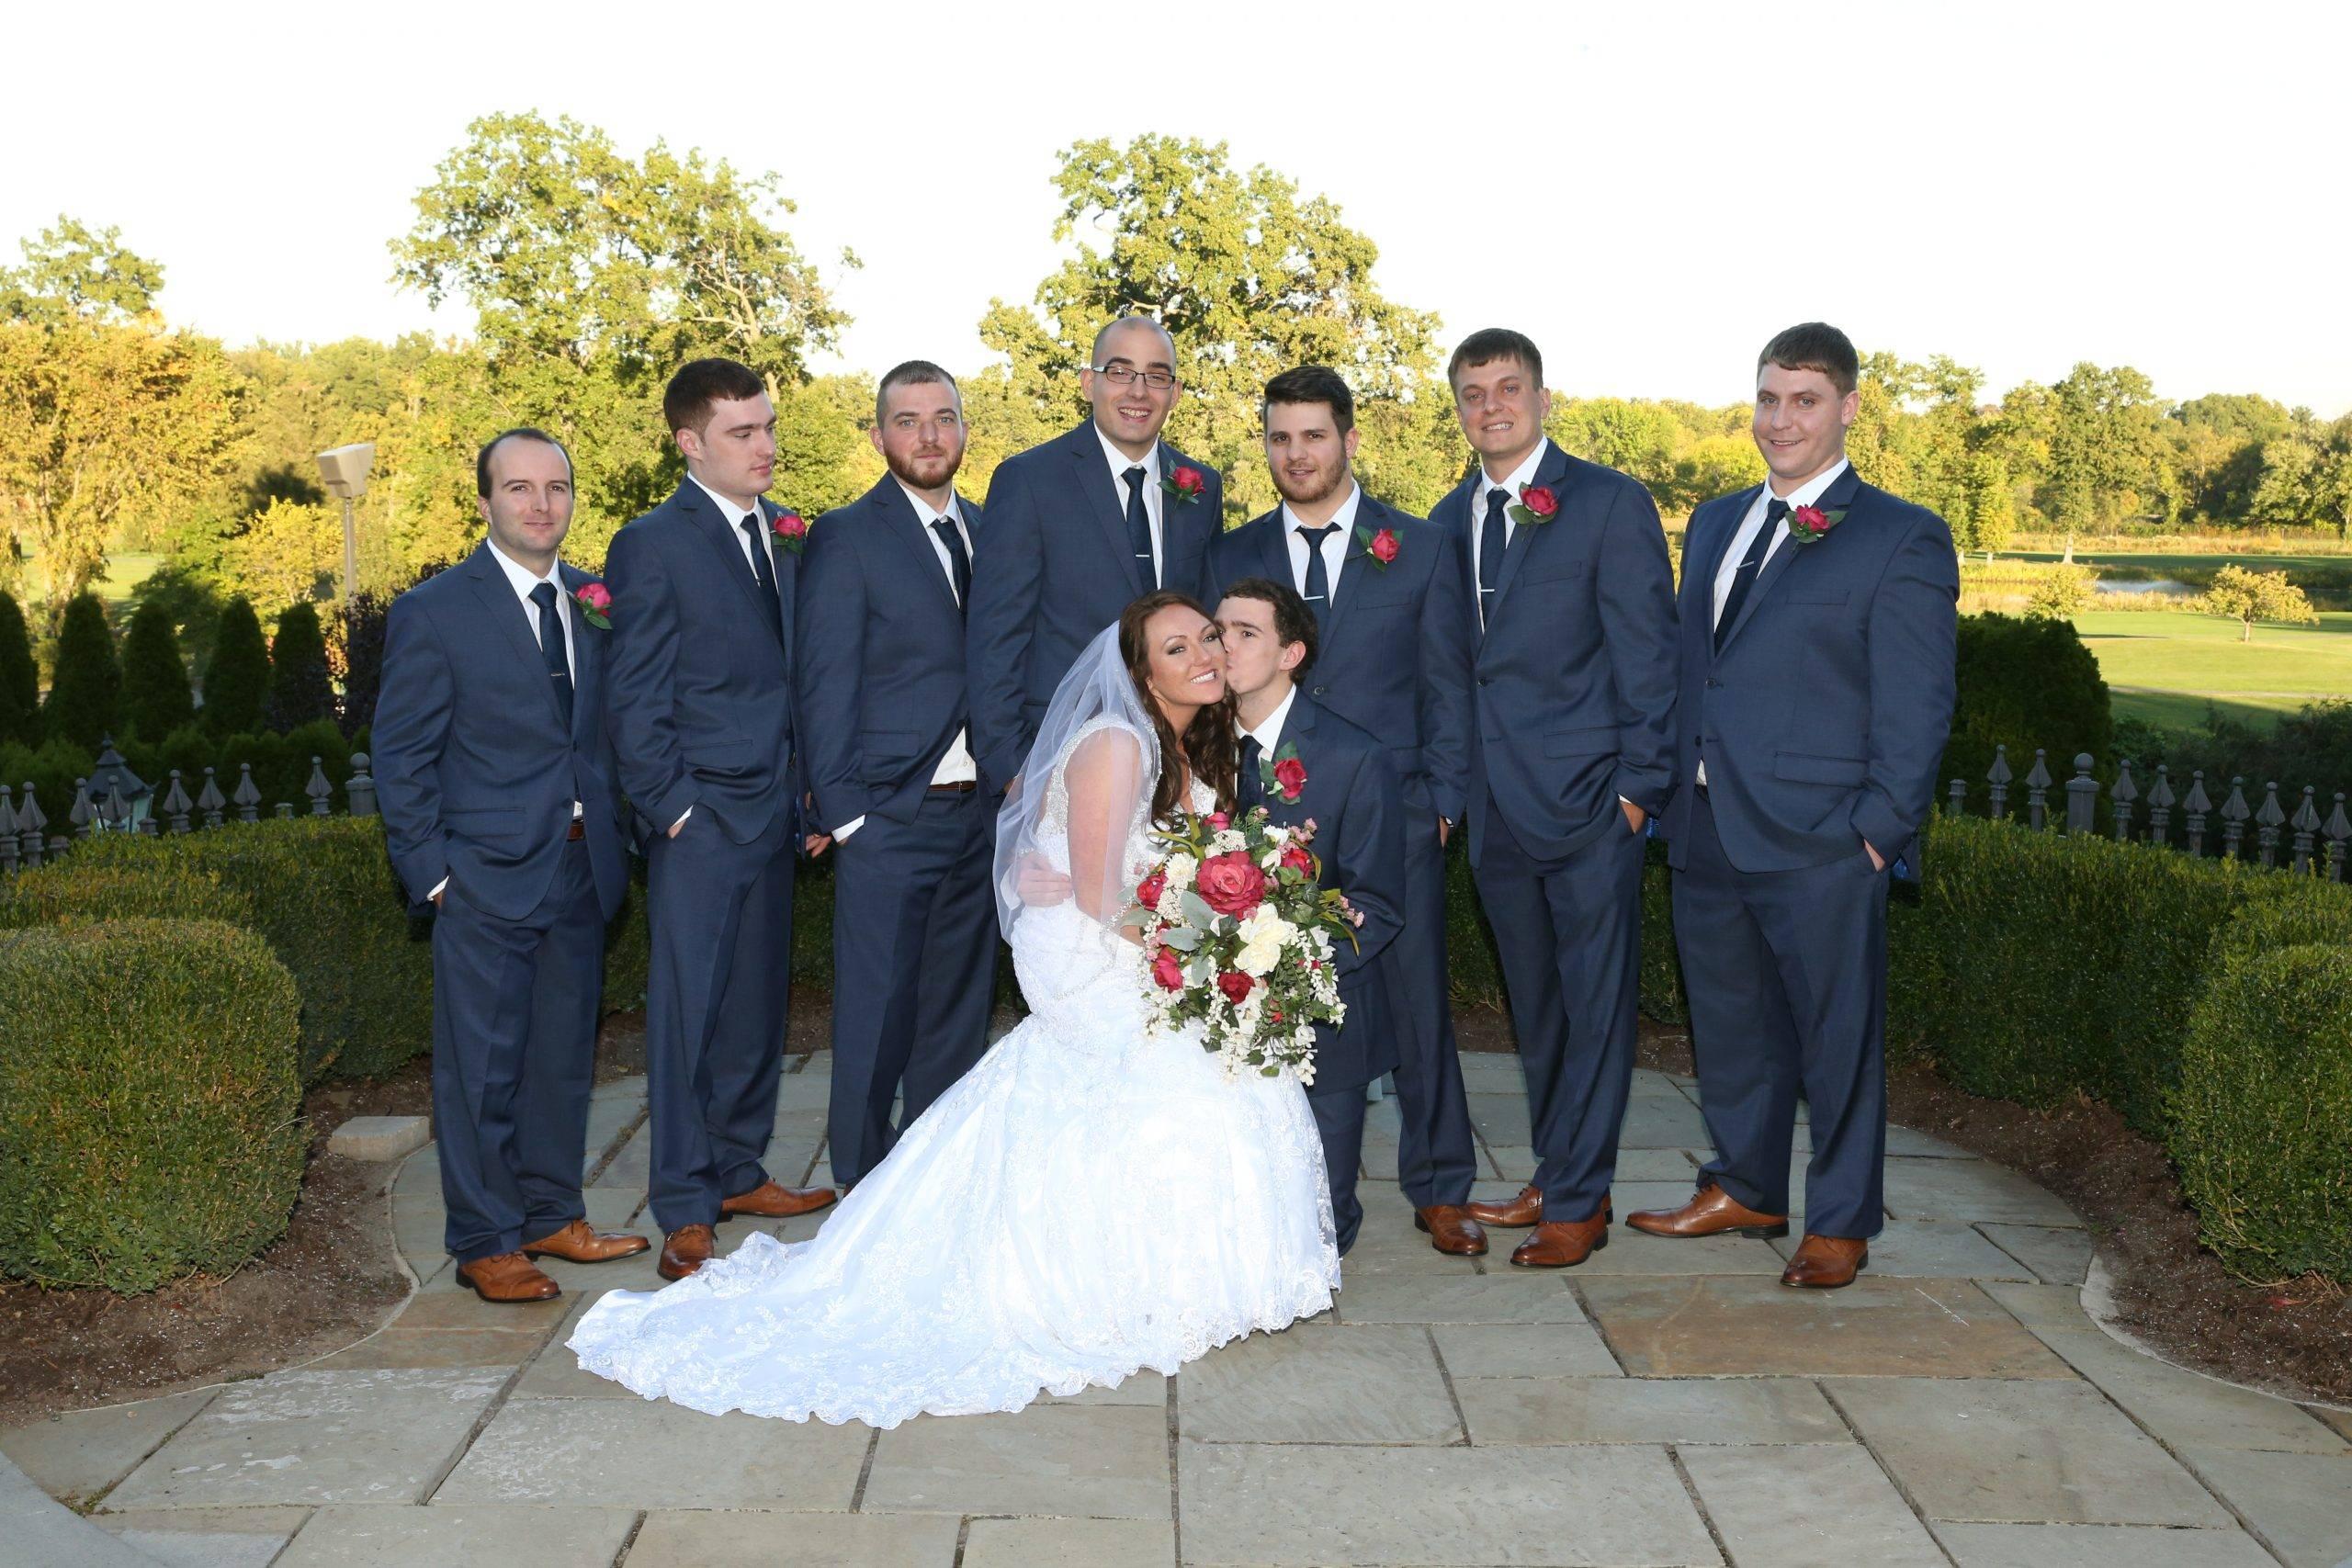 Park Savoy groomsmen with bride and groom